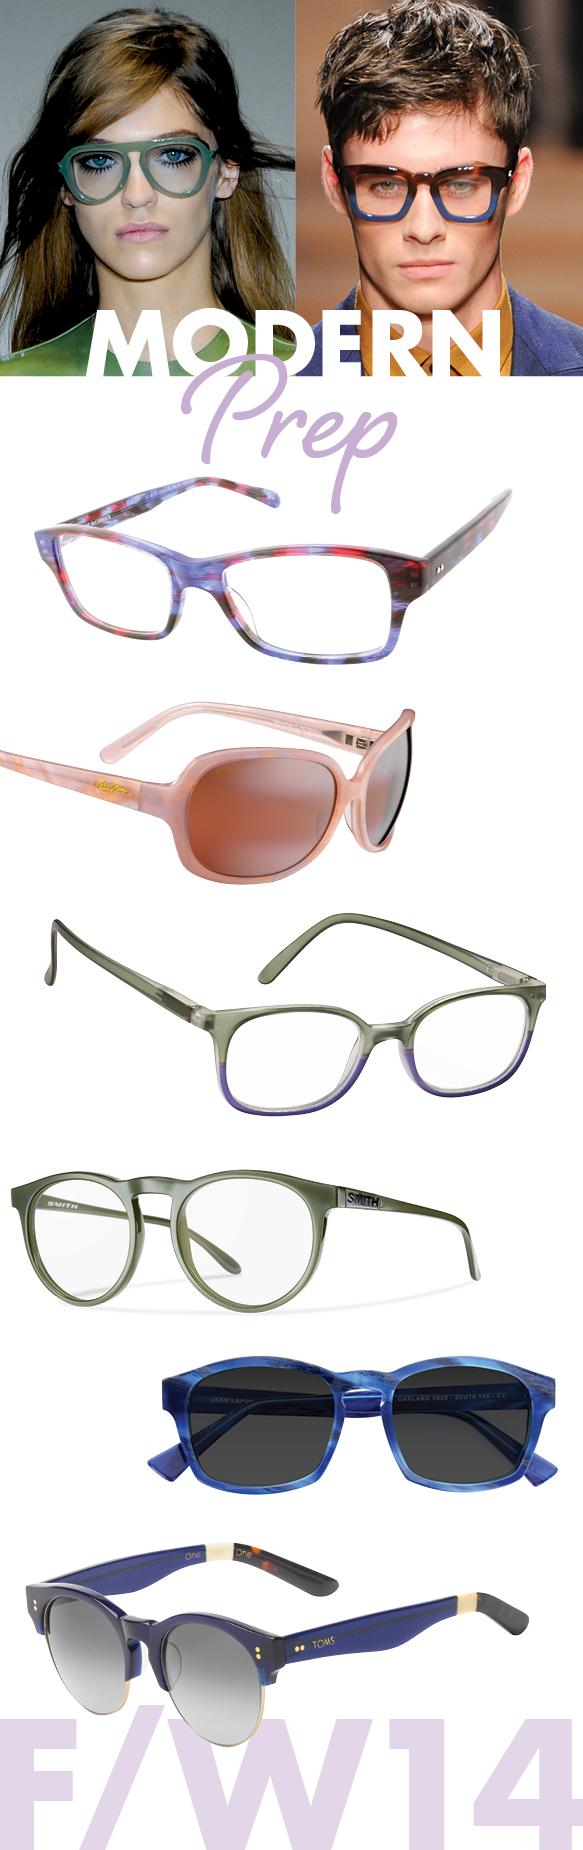 Corinne McCormack (Jess), Maui Jim (Rainbow Falls), ICU Eyewear (7391), Smith Optics (Maddox), Lafont (OAKLAND), TOMS (Charlie Rae)